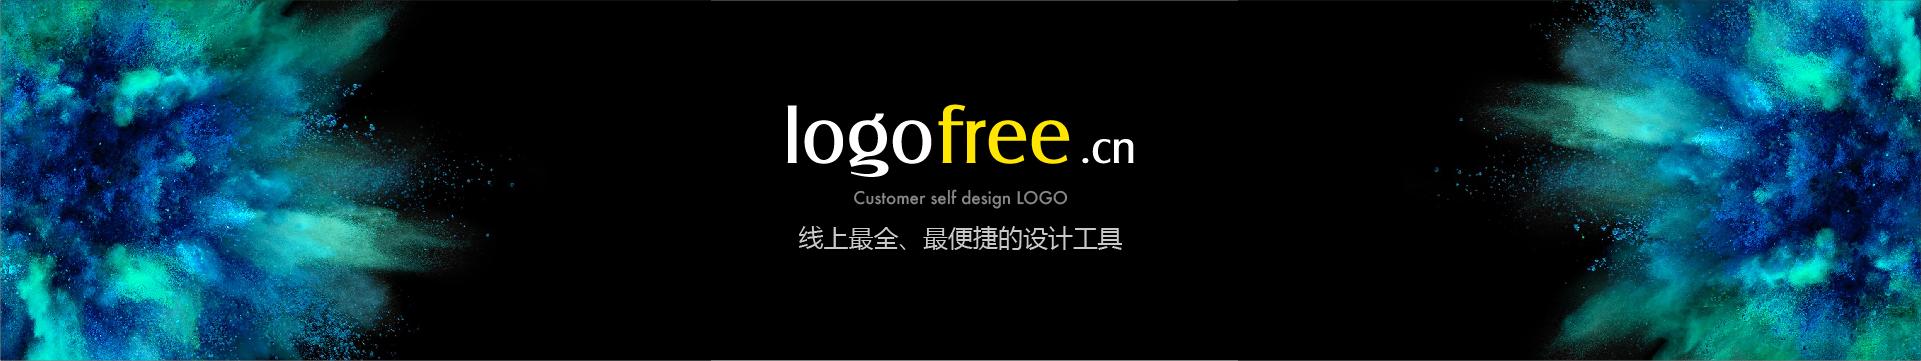 logofree,线上最全、最便捷的标志设计、商标设计工具。最好的logo设计在线生成器。